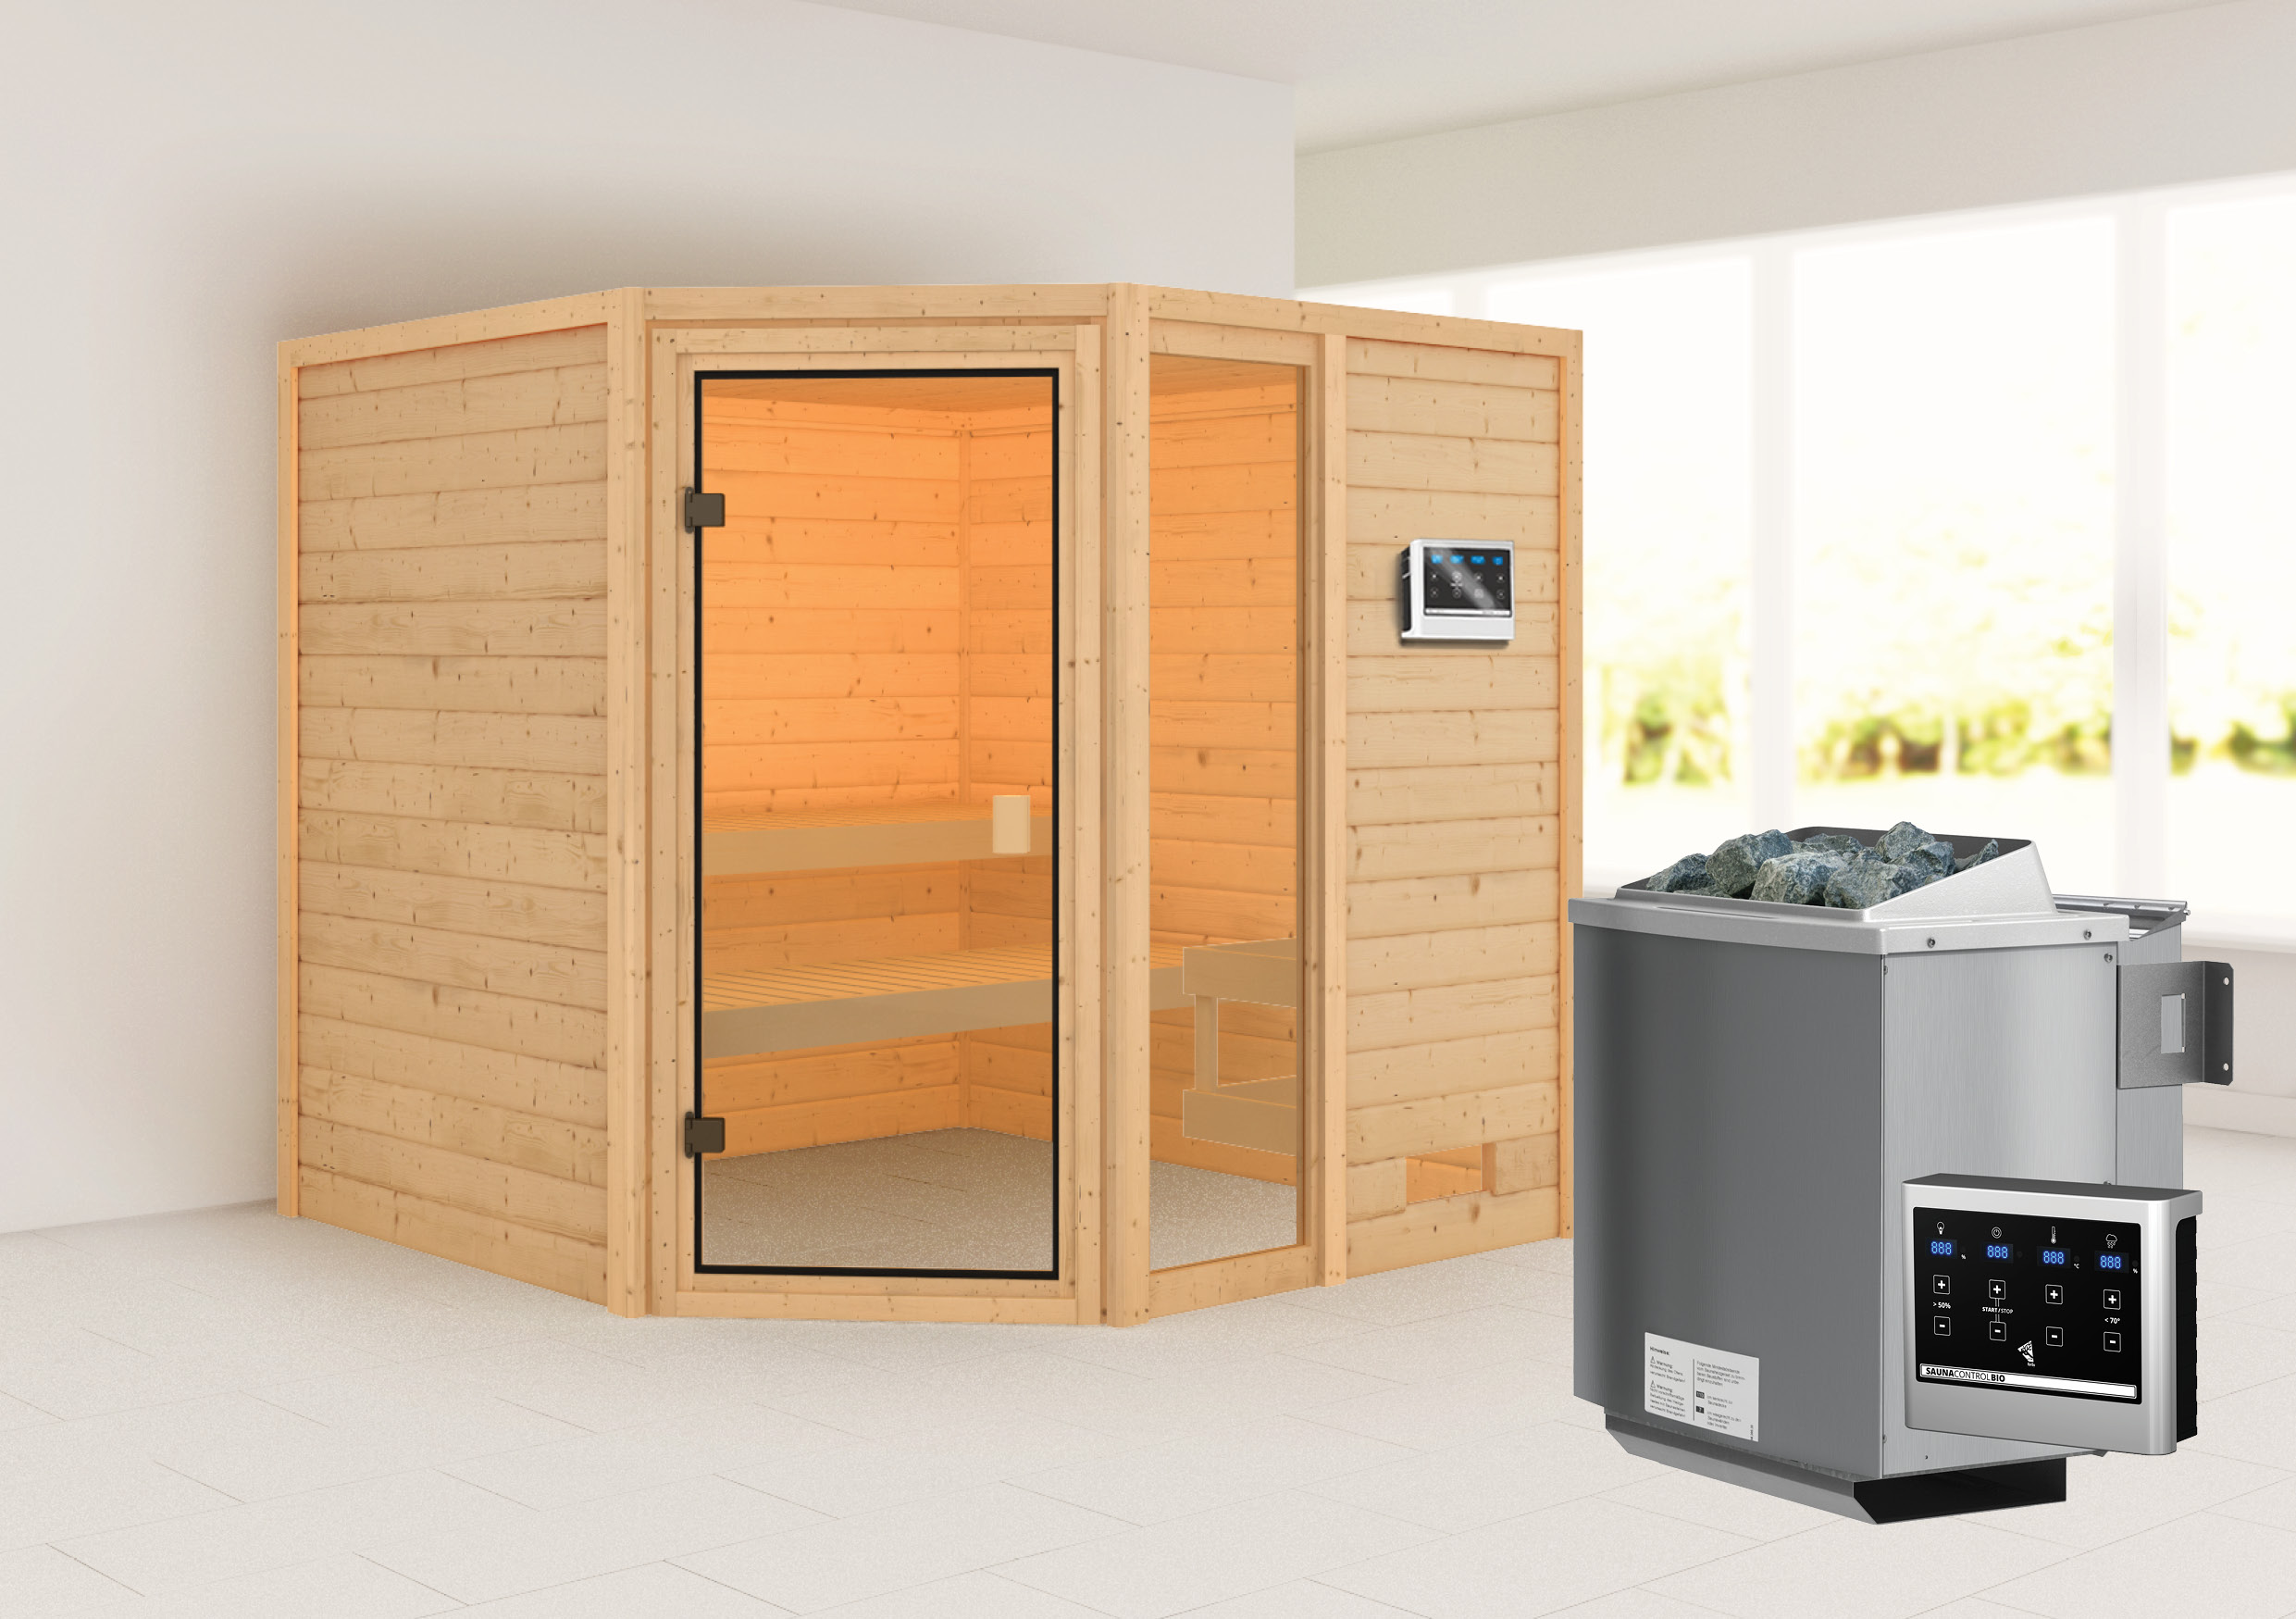 Woodfeeling Sauna Tabea 38mm Bio Saunaofen 9 kW extern Bild 1